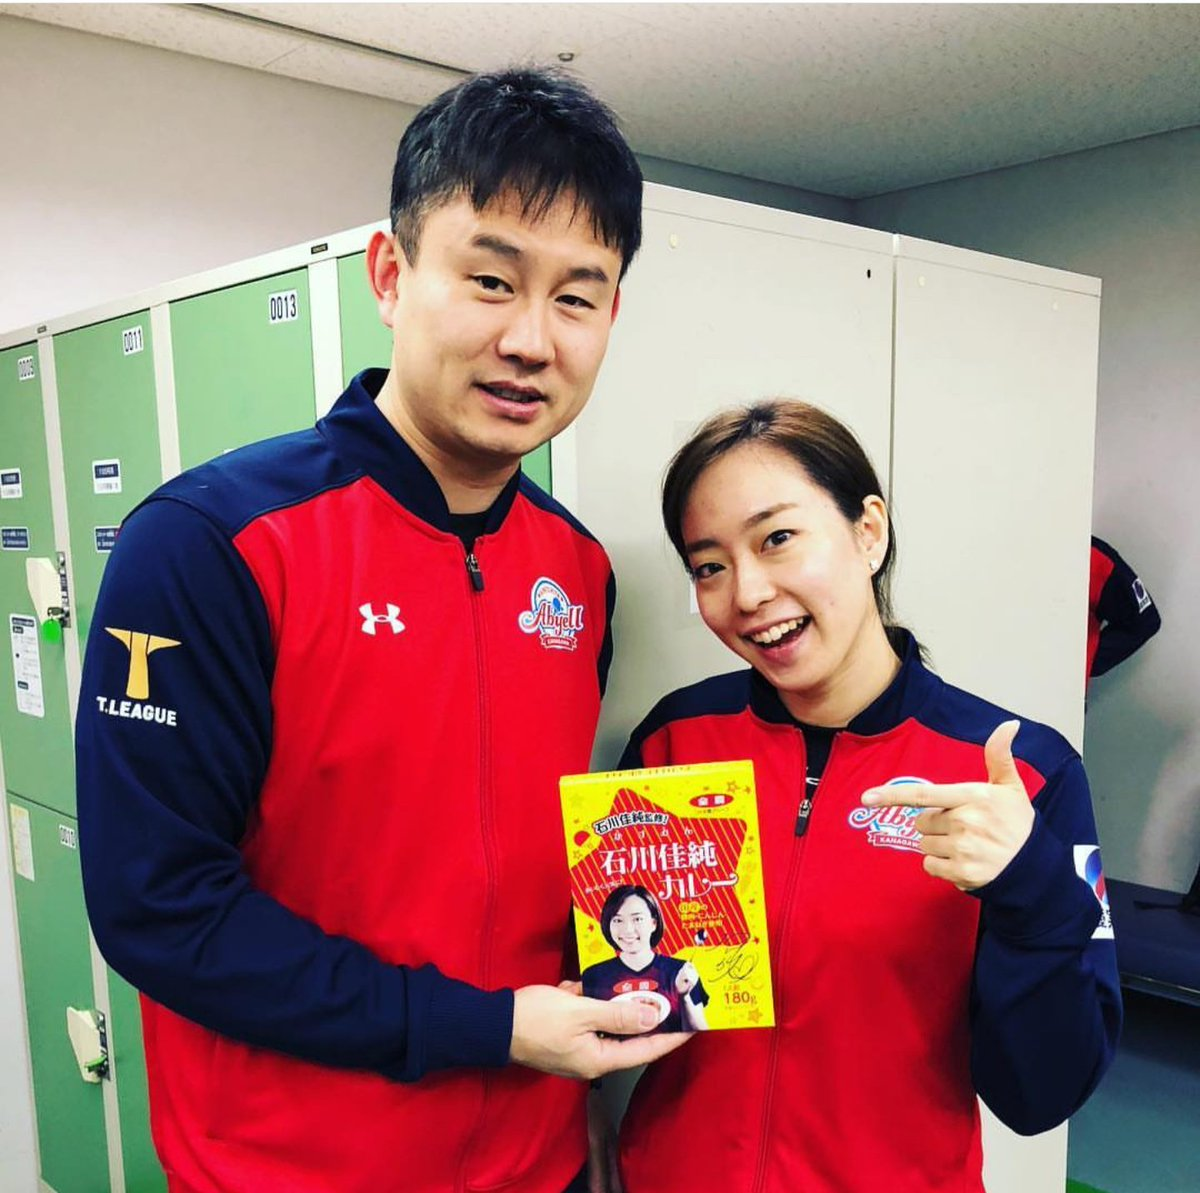 Instagram 石川 佳純 石川佳純、インスタグラム開設 初投稿にファンも「可愛すぎます大好きです」